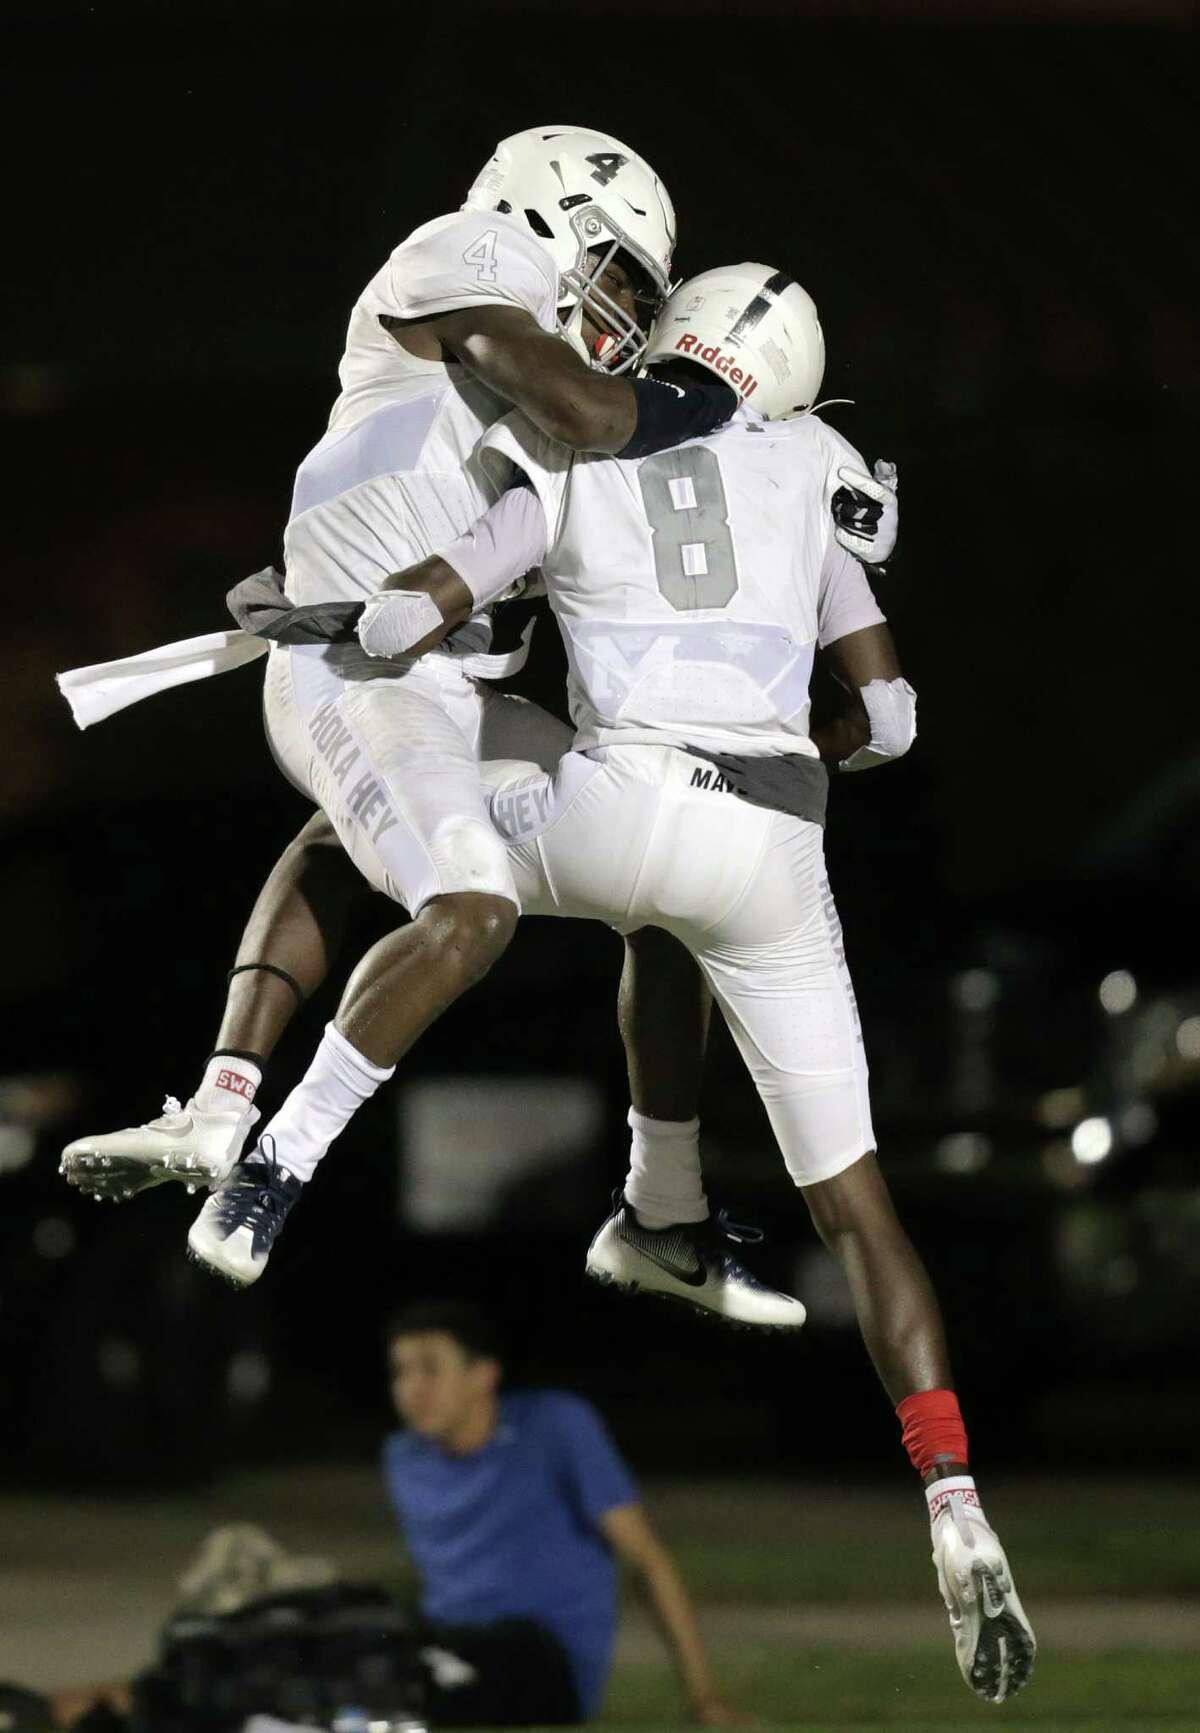 Sept. 1: Manvel 26, North Shore 13 Manvel's Ceylon Stokes (4) and Kam Scott (8) celebrate Scott's touchdown in the fourth quarter against North Shore High Schools on Thursday, Sept. 1, 2016, in Houston. Manvel won the game 26-13.